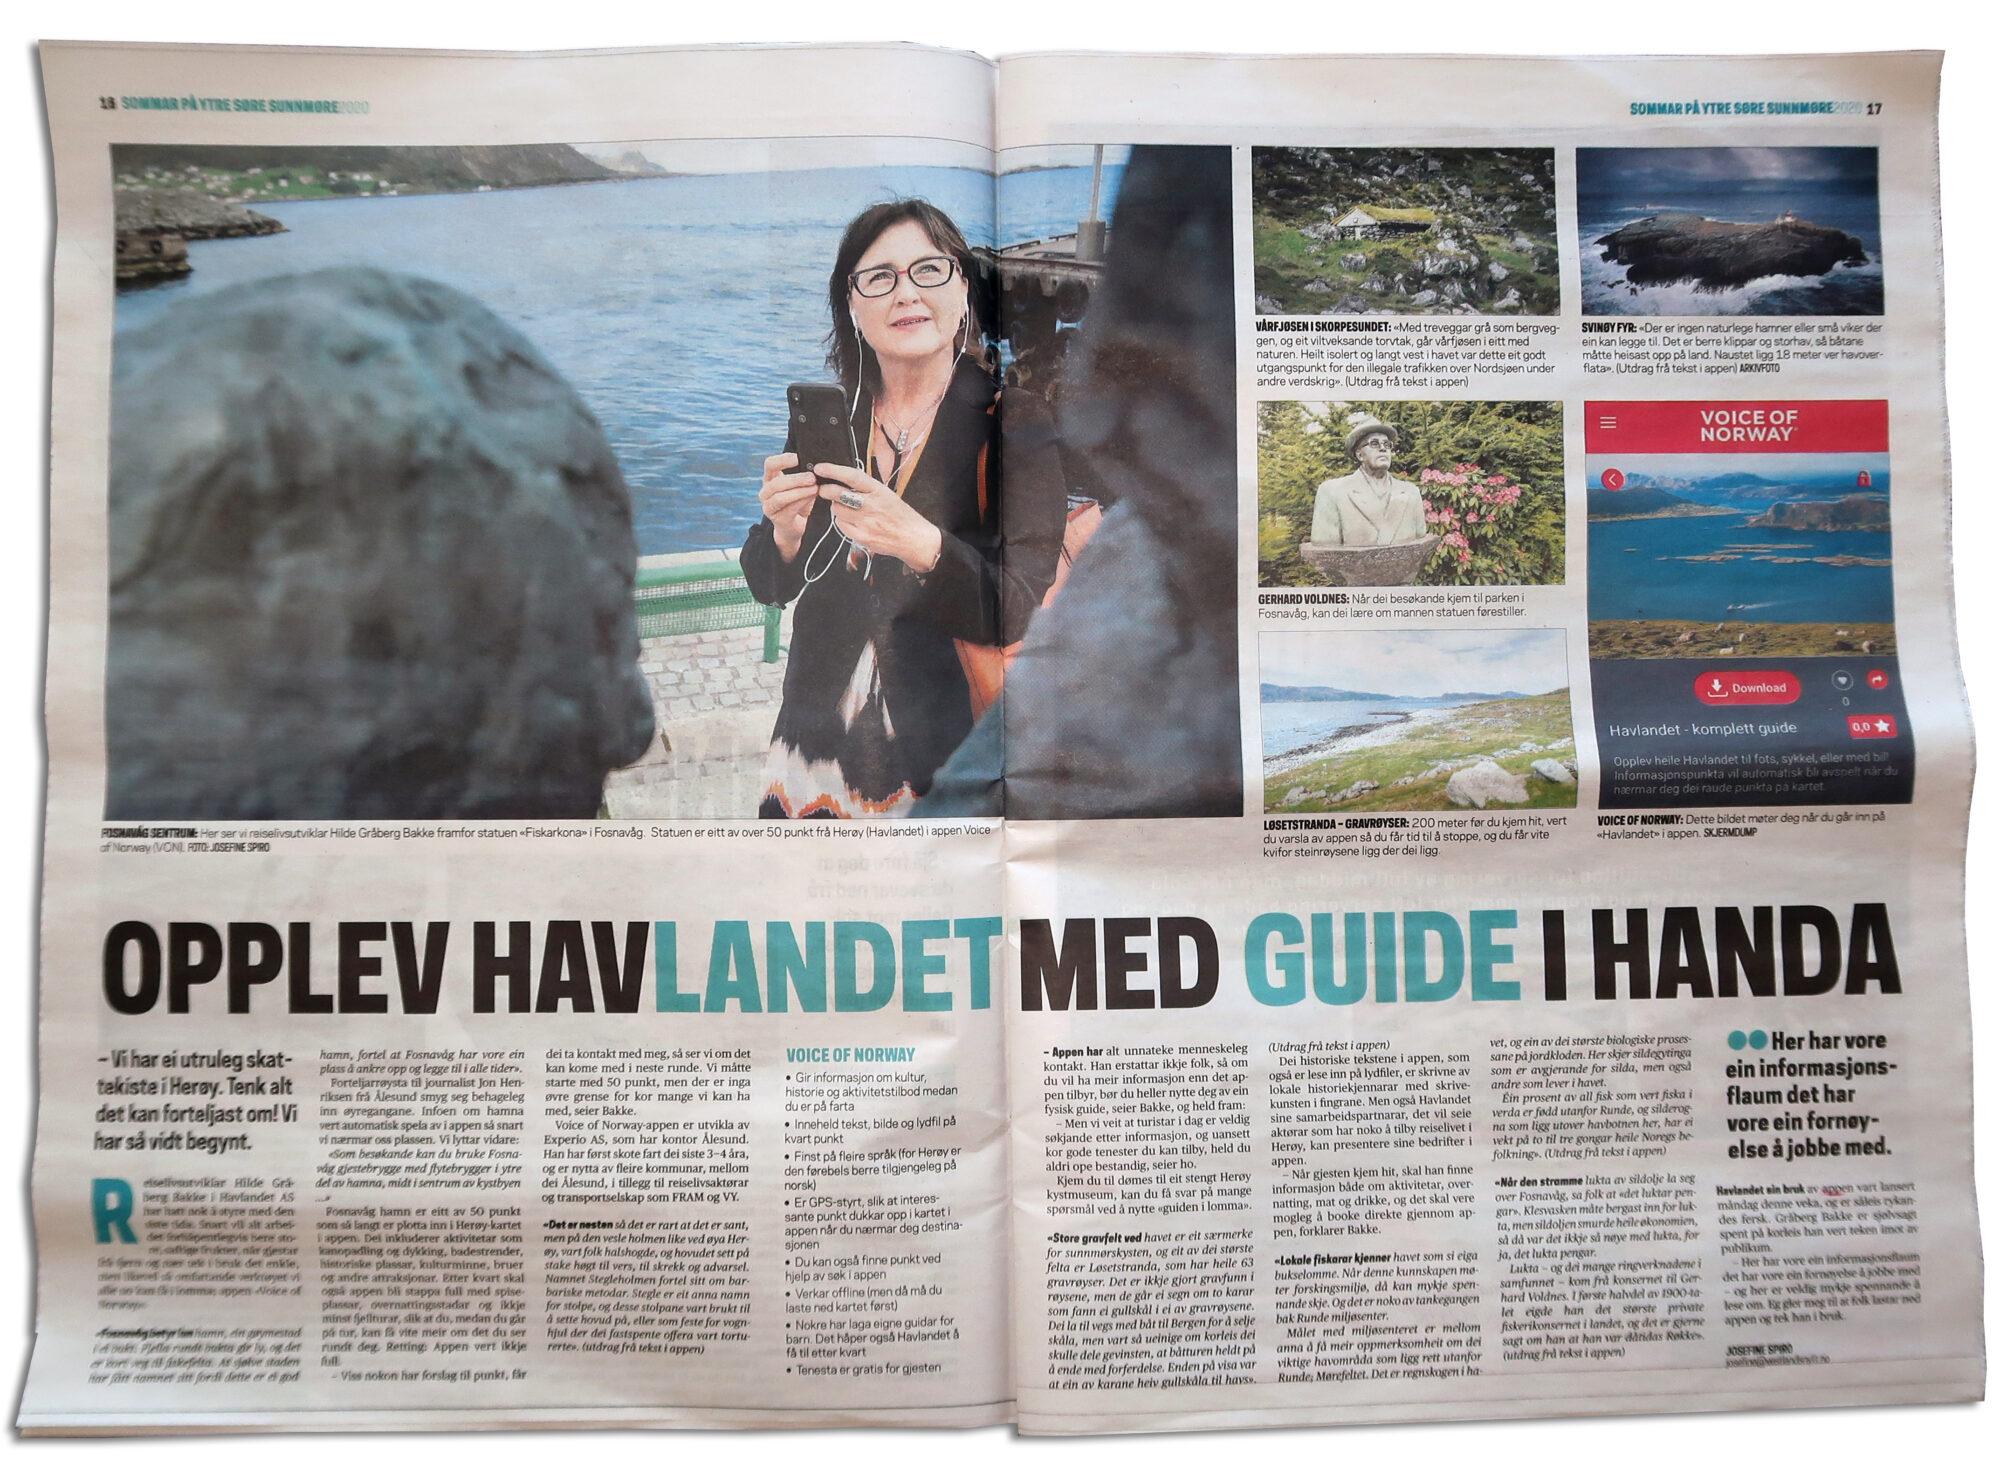 Vestlandsnytt-Havlandet-Fosnavaag-reisegude-reiseapp-lydguide-app-mobilguide_Voice-Of-Norway